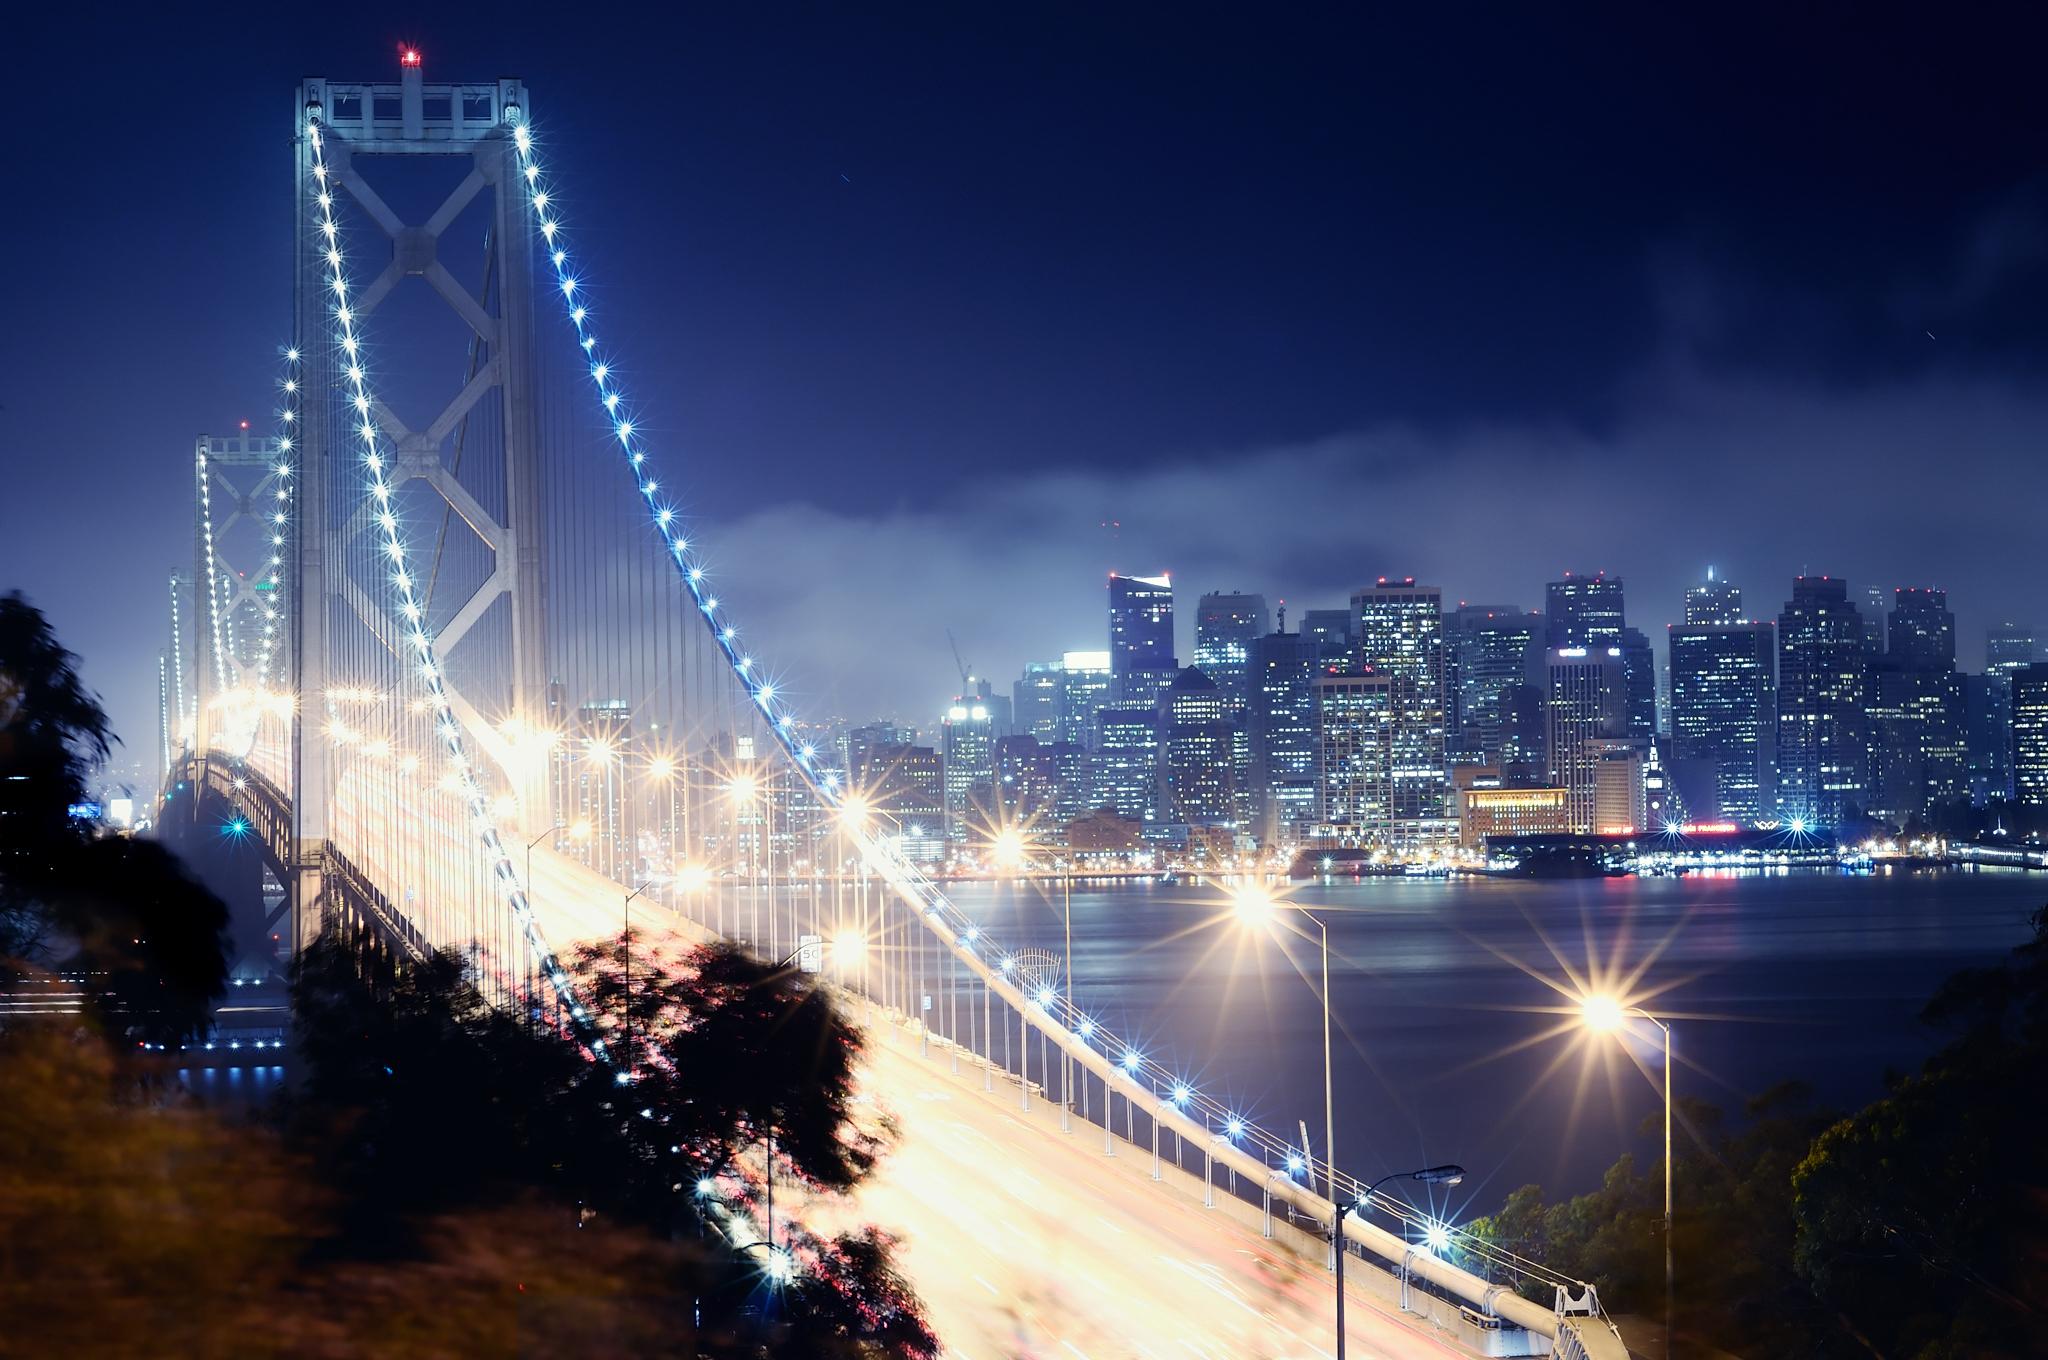 Evening Crossing, Bay Bridge, San Francisco, California  № 3721029 бесплатно